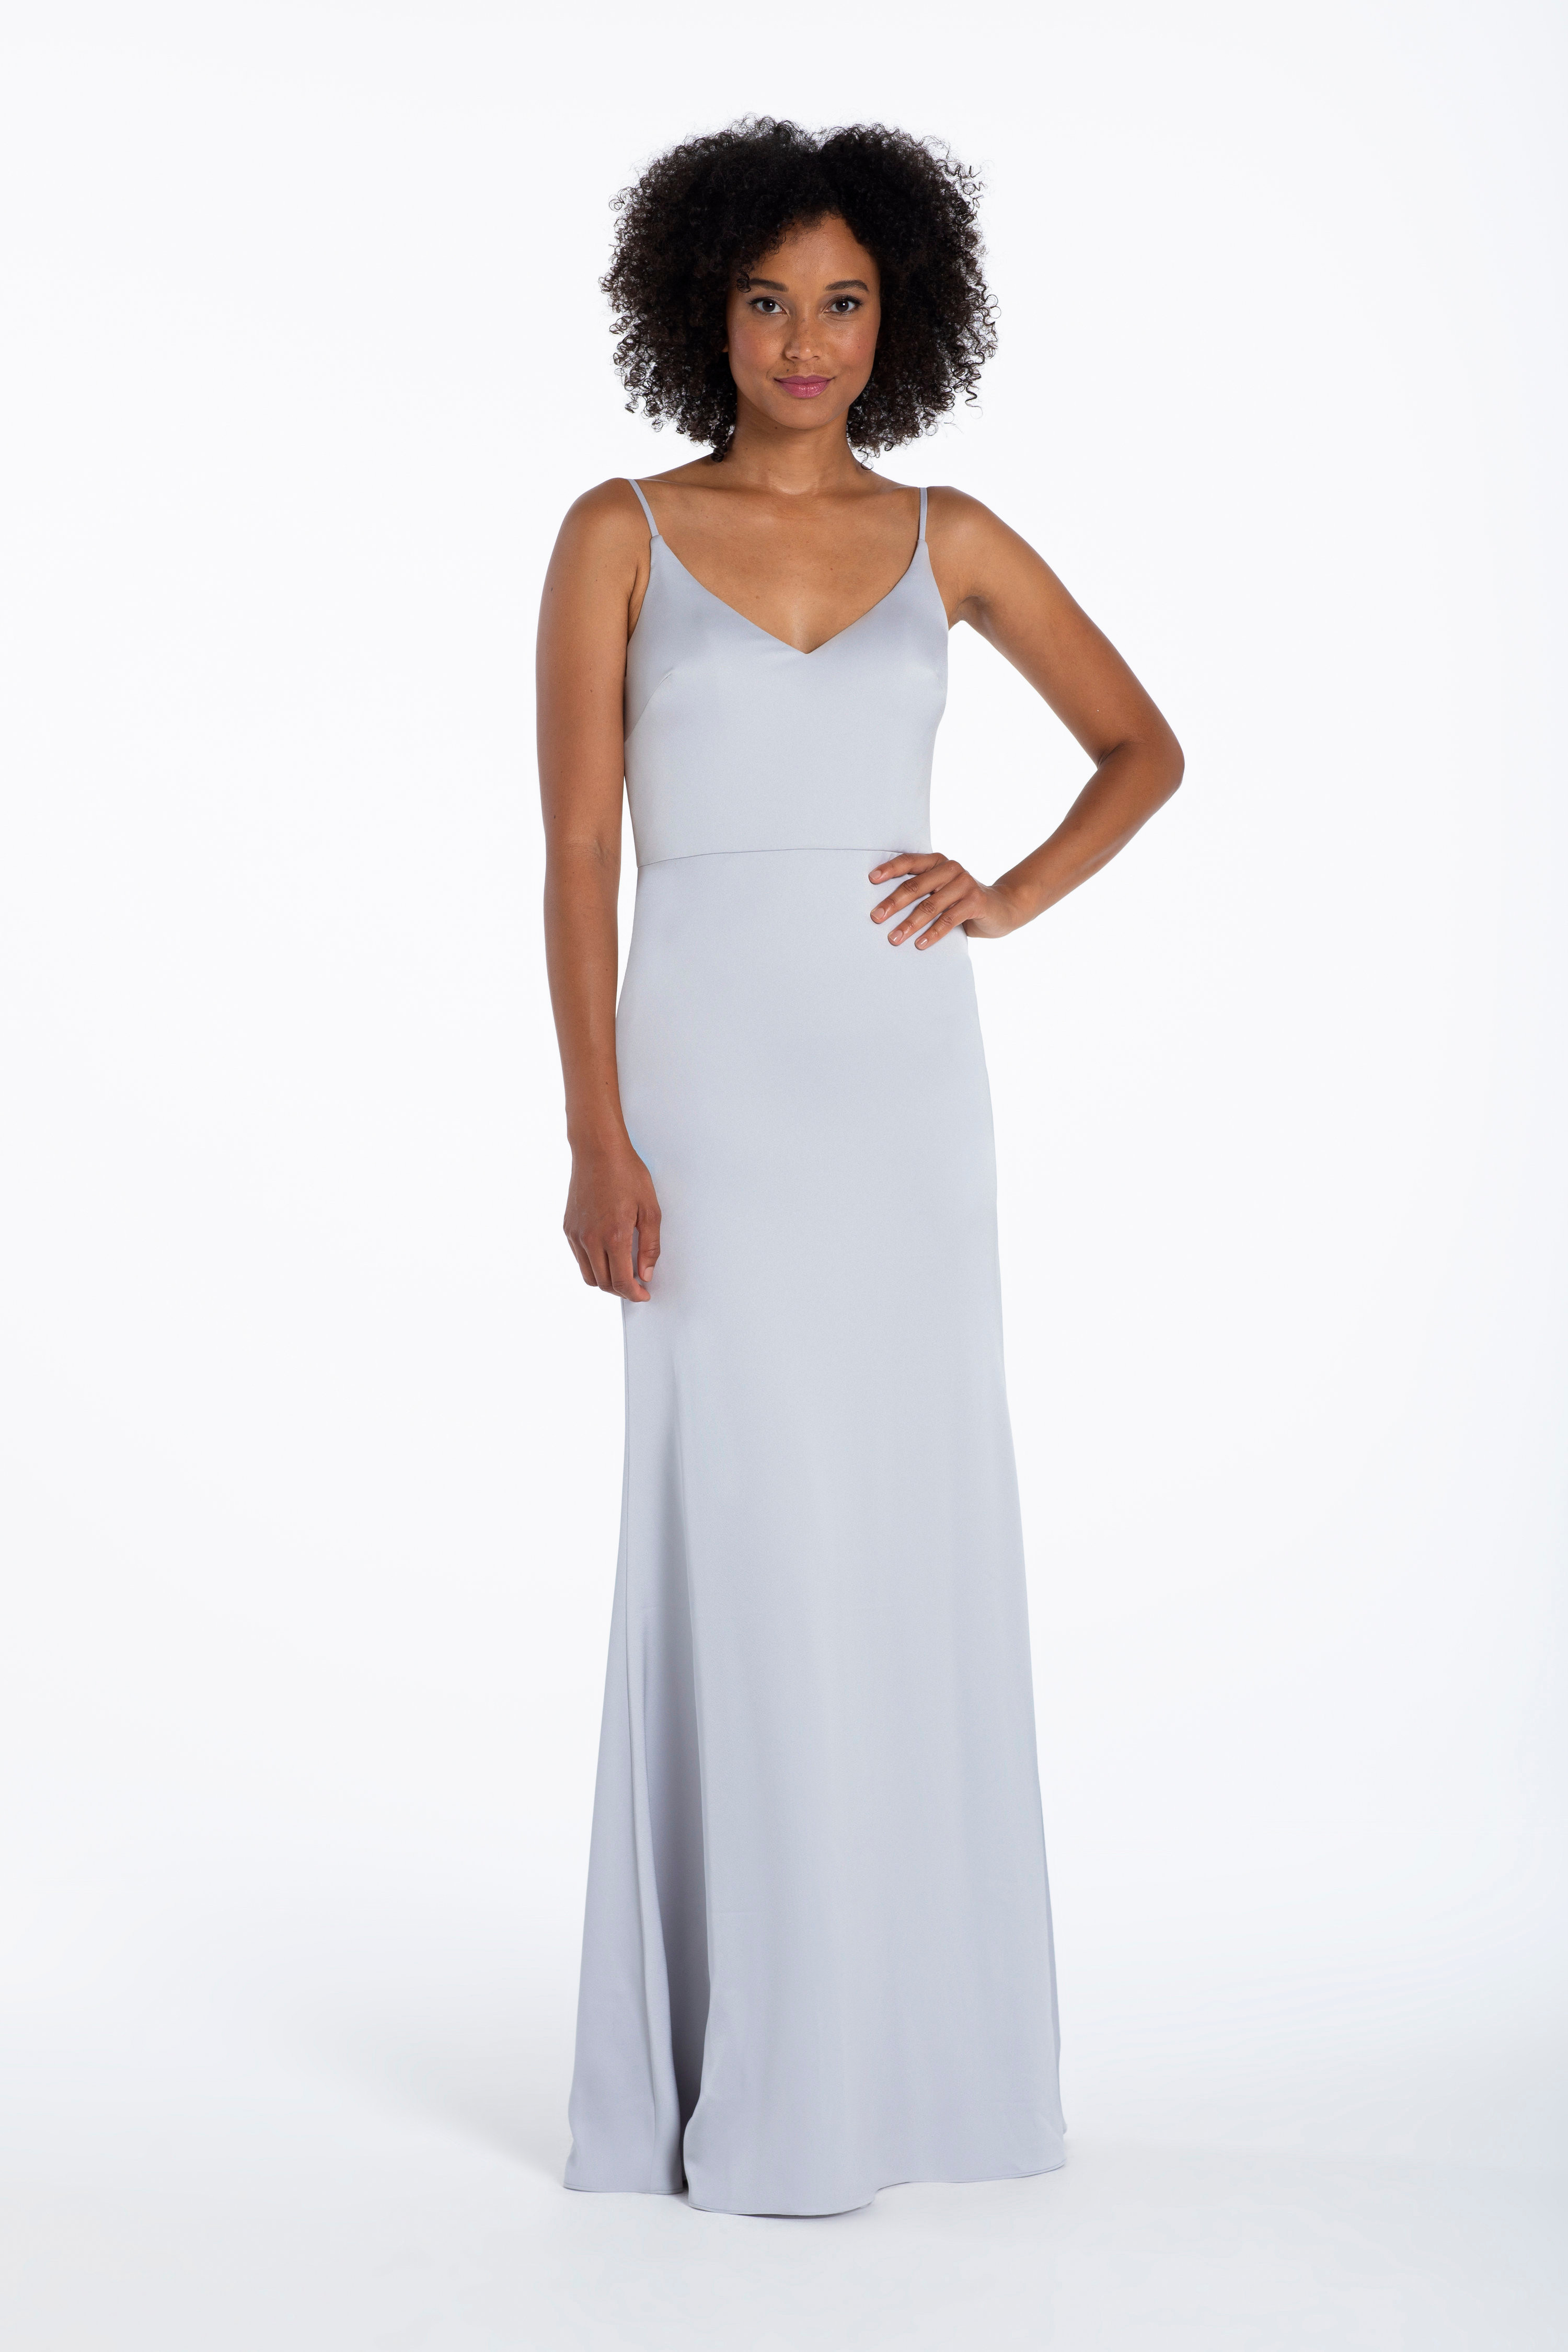 crepe de chine A-line gown, V-neckline, natural waist.